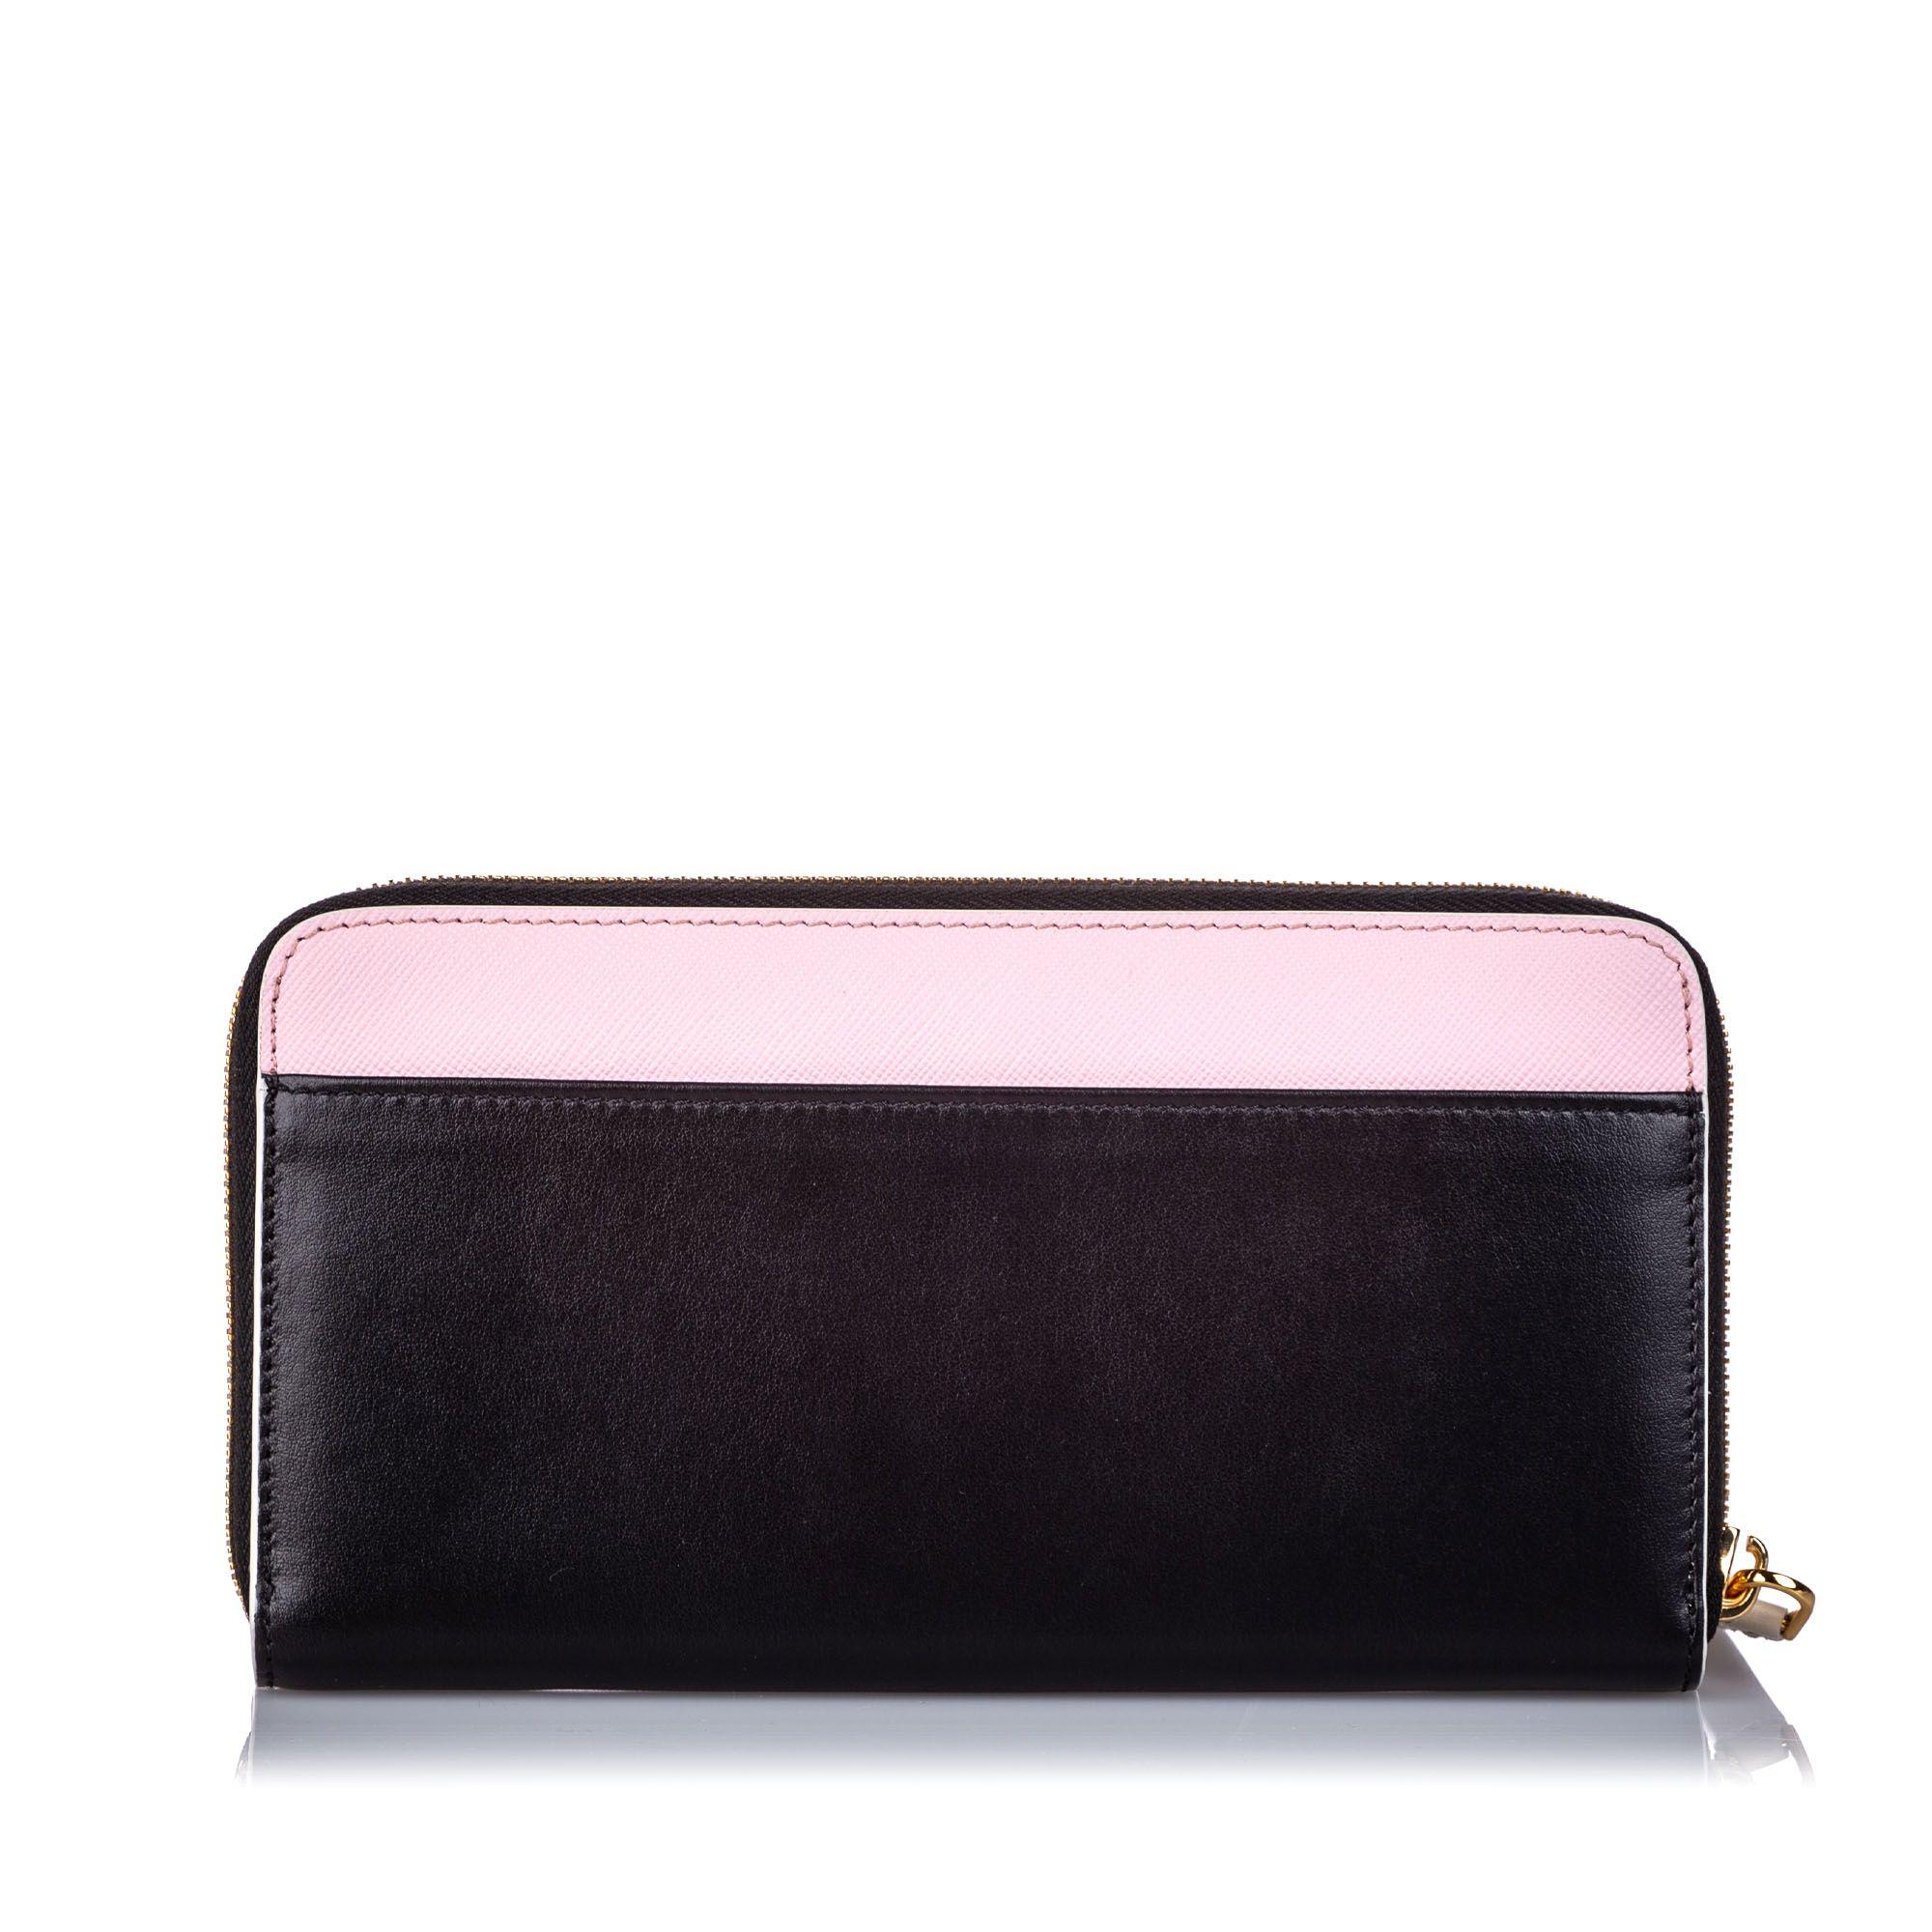 Marni Leather Zip Wallet Black